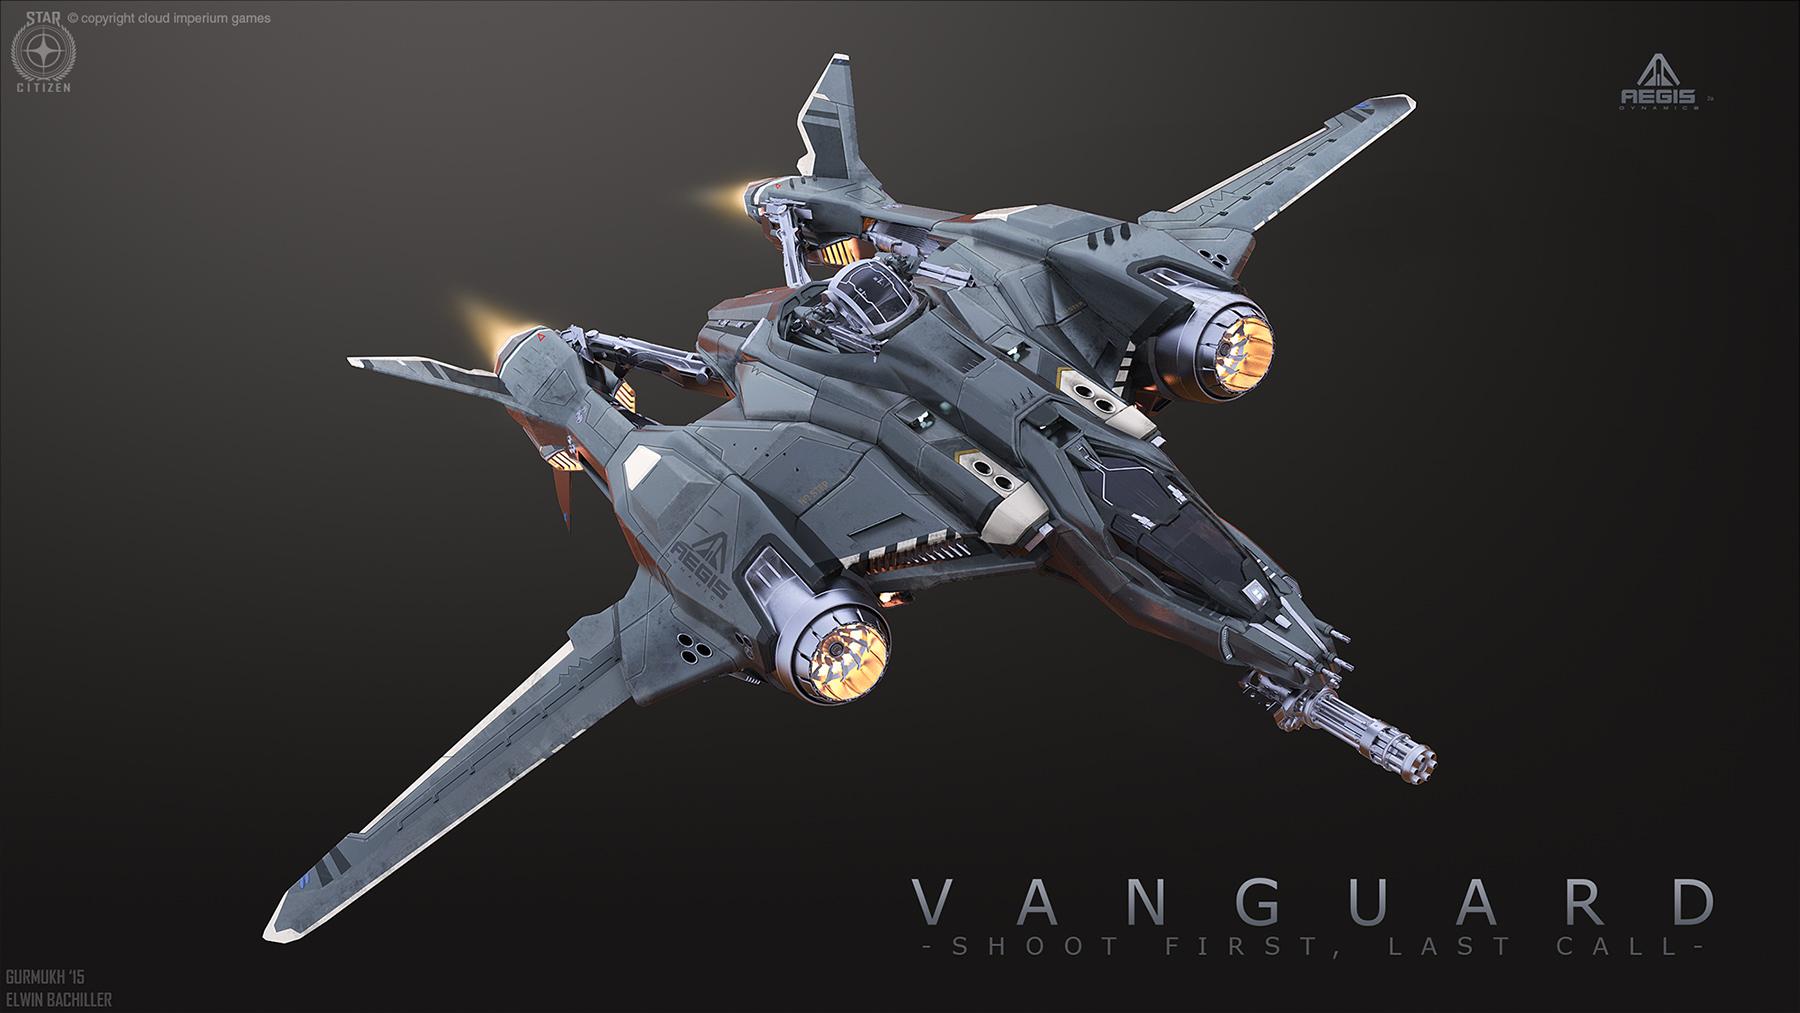 Vanguard - Vanguard From Star Citizen